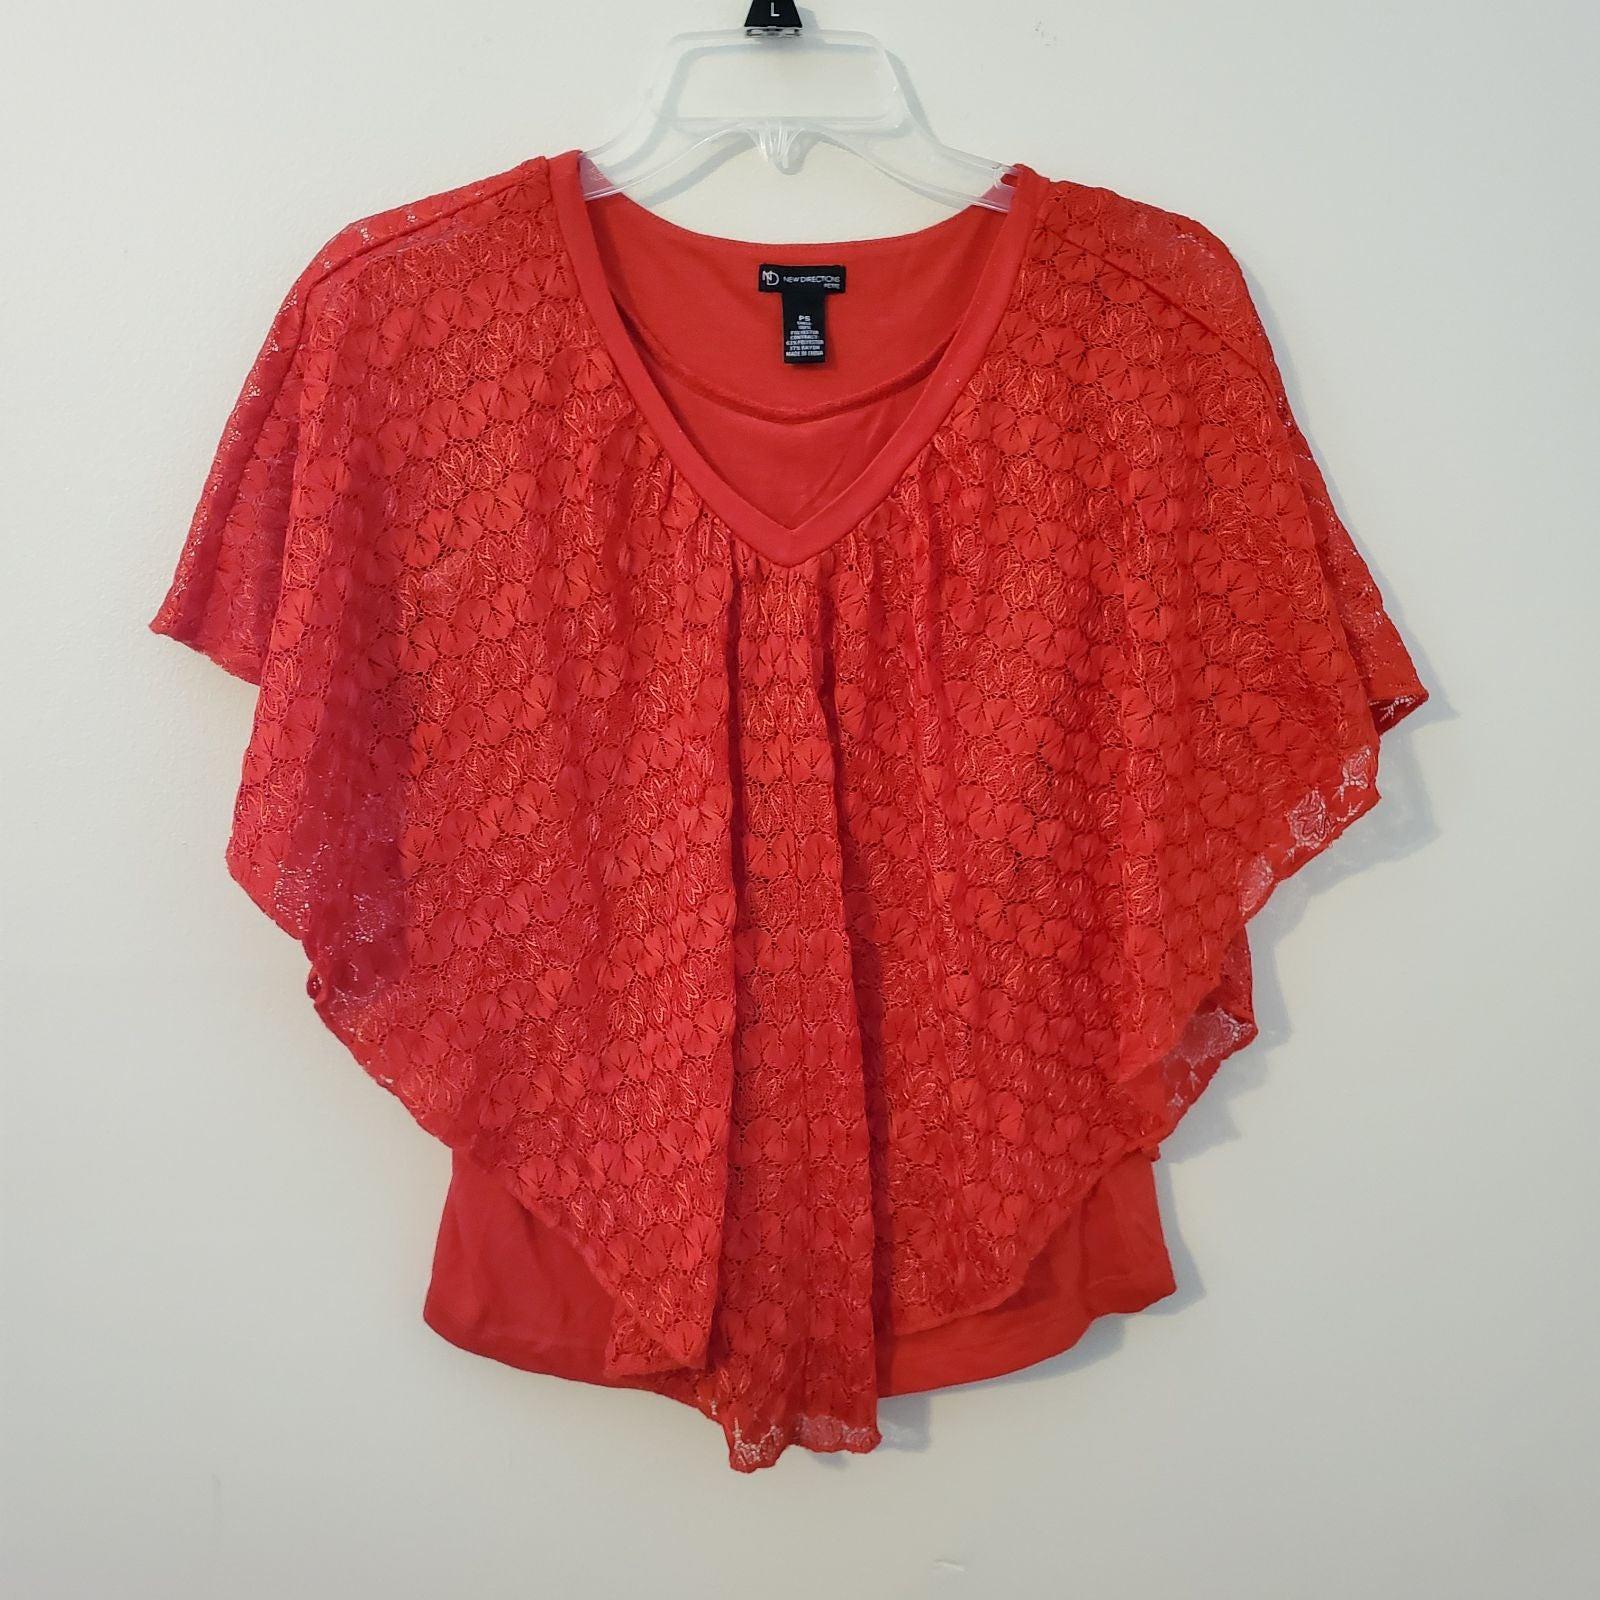 New Directions Petite Crochet Top PS